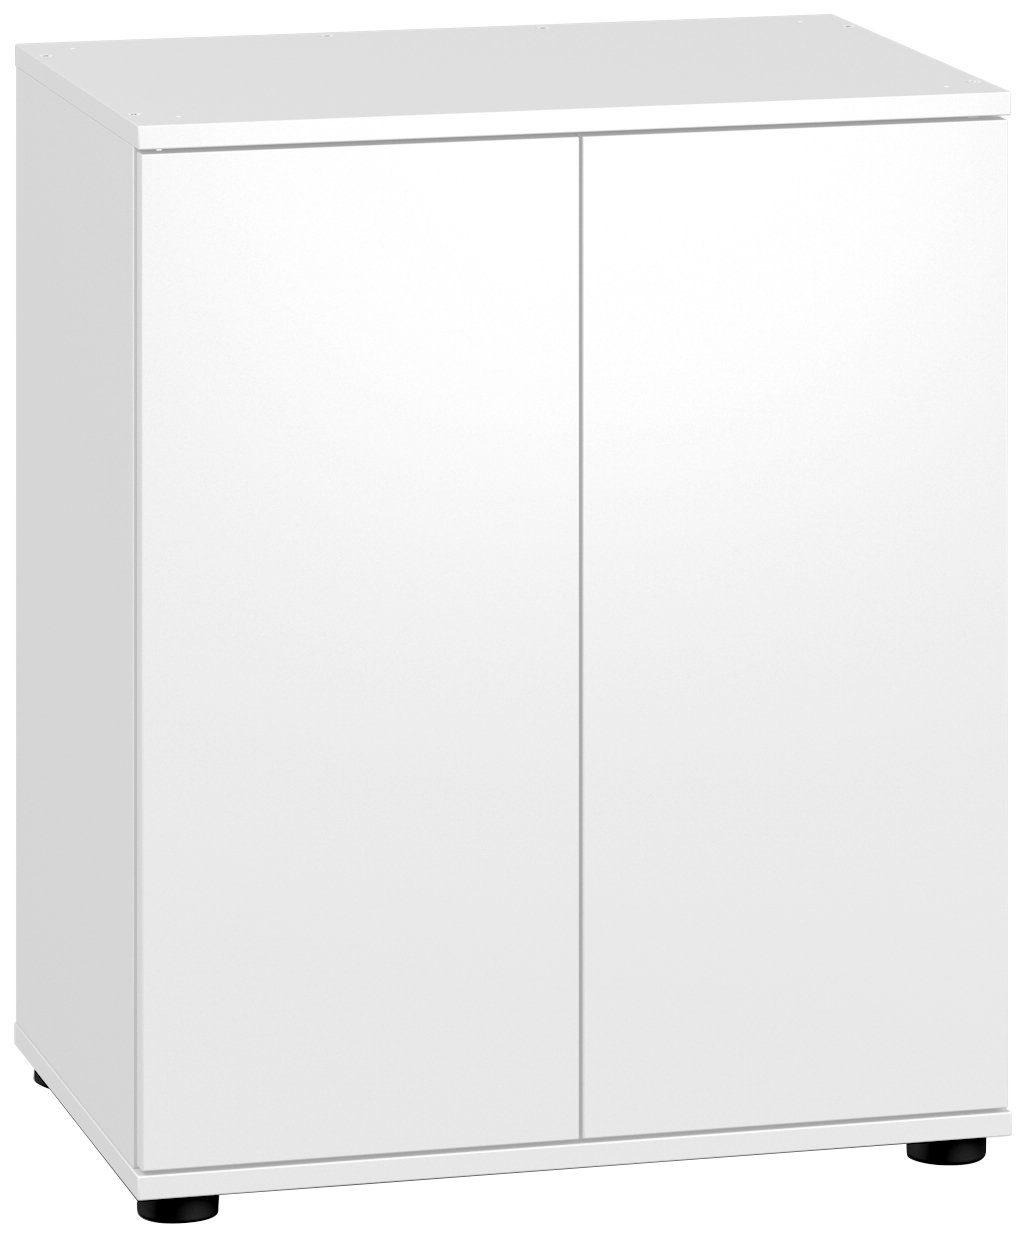 Aquarien-Unterschrank »SBX Lido 120«, BxTxH: 61x41x73 cm, weiß